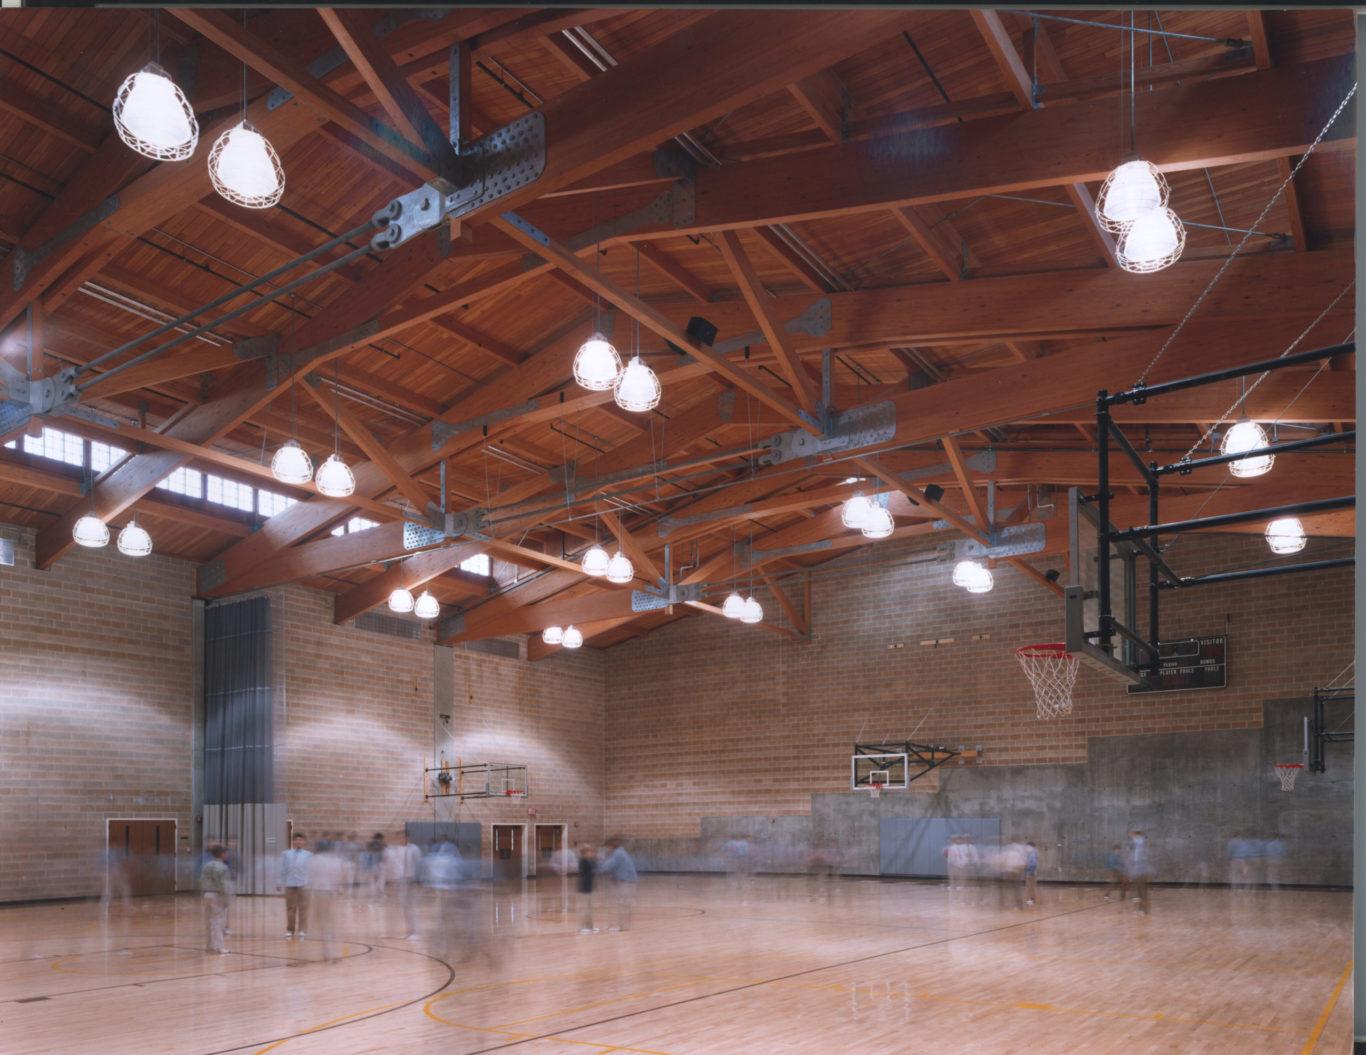 Slide 4 of 7, Brunswick School – Athletic Center